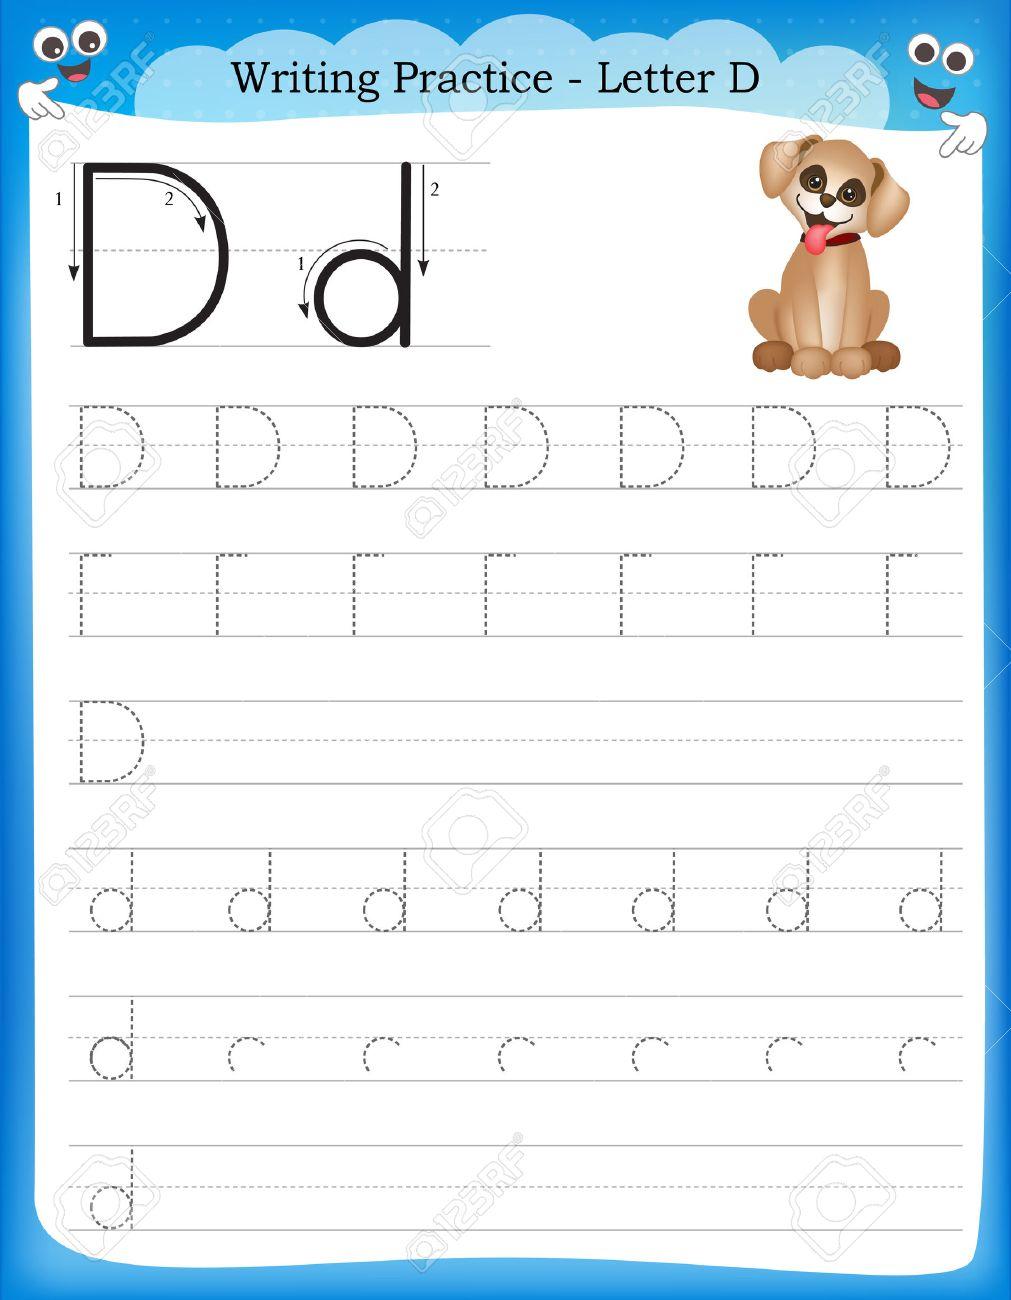 Writing Practice Letter D Printable Worksheet For Preschool – Writing Skills Worksheets